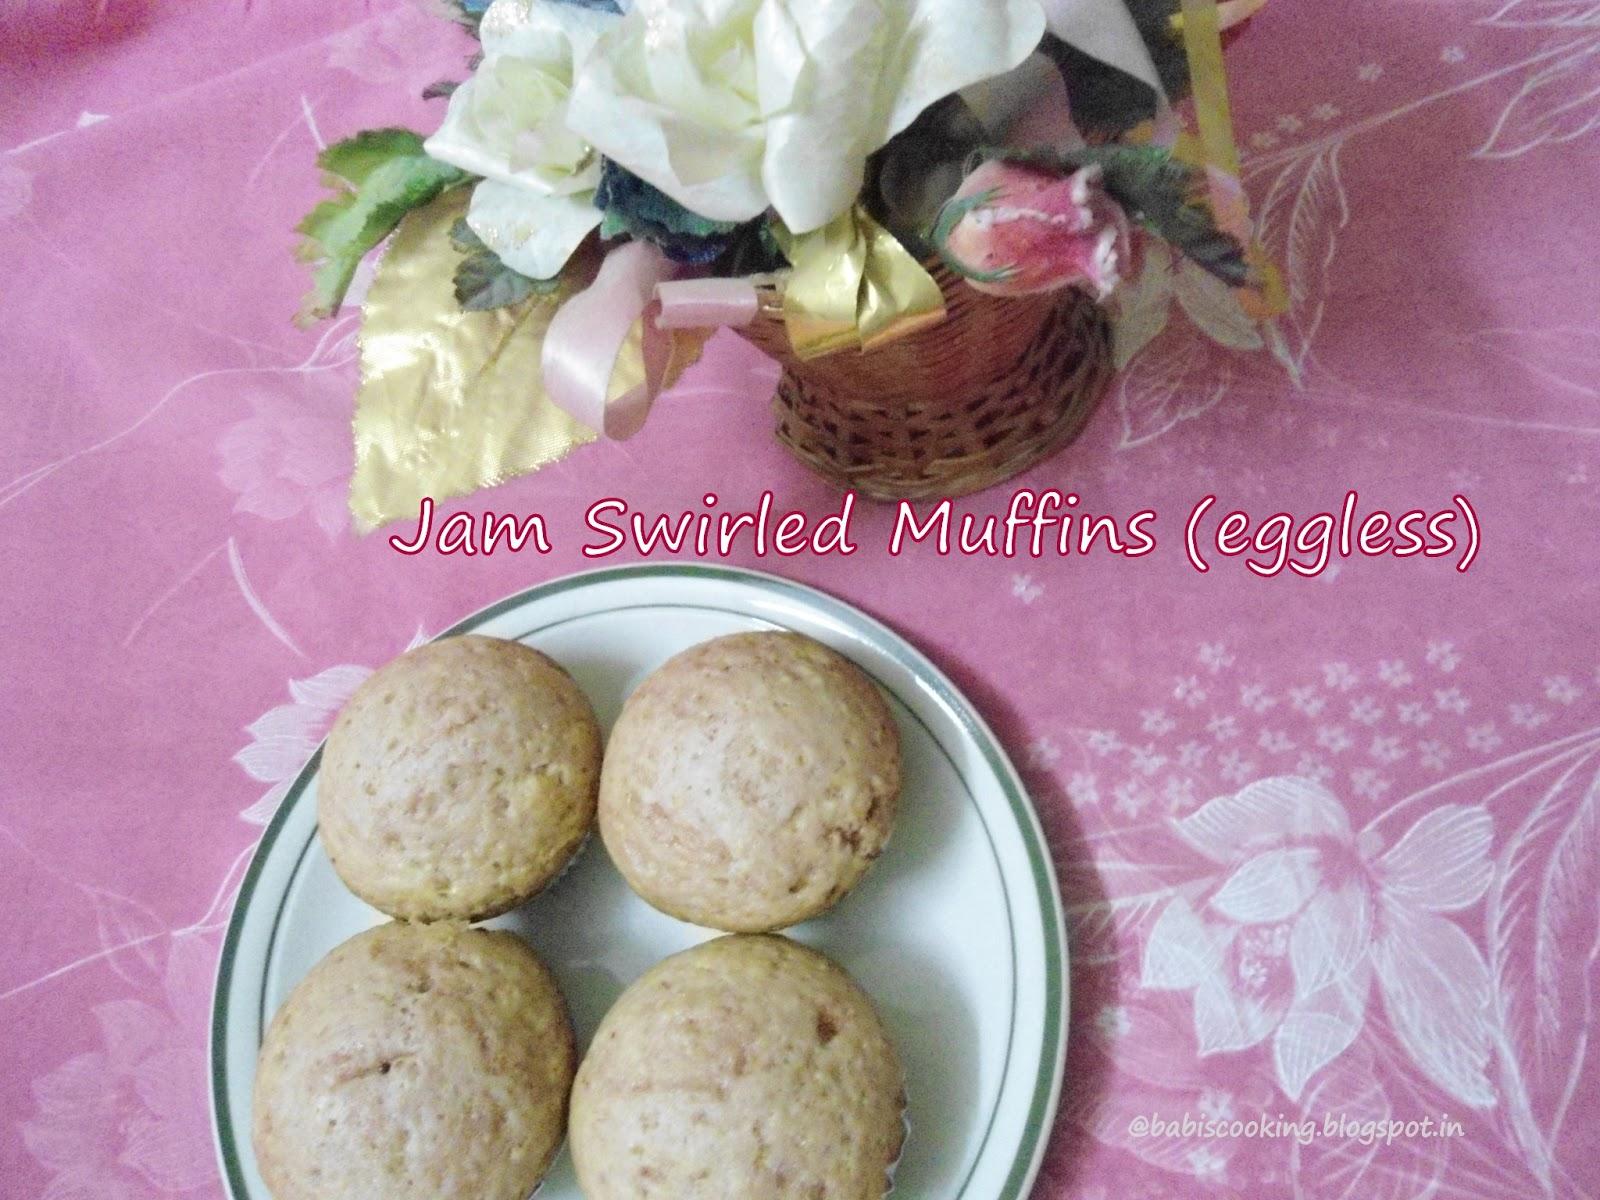 Eggless jam swirled muffins